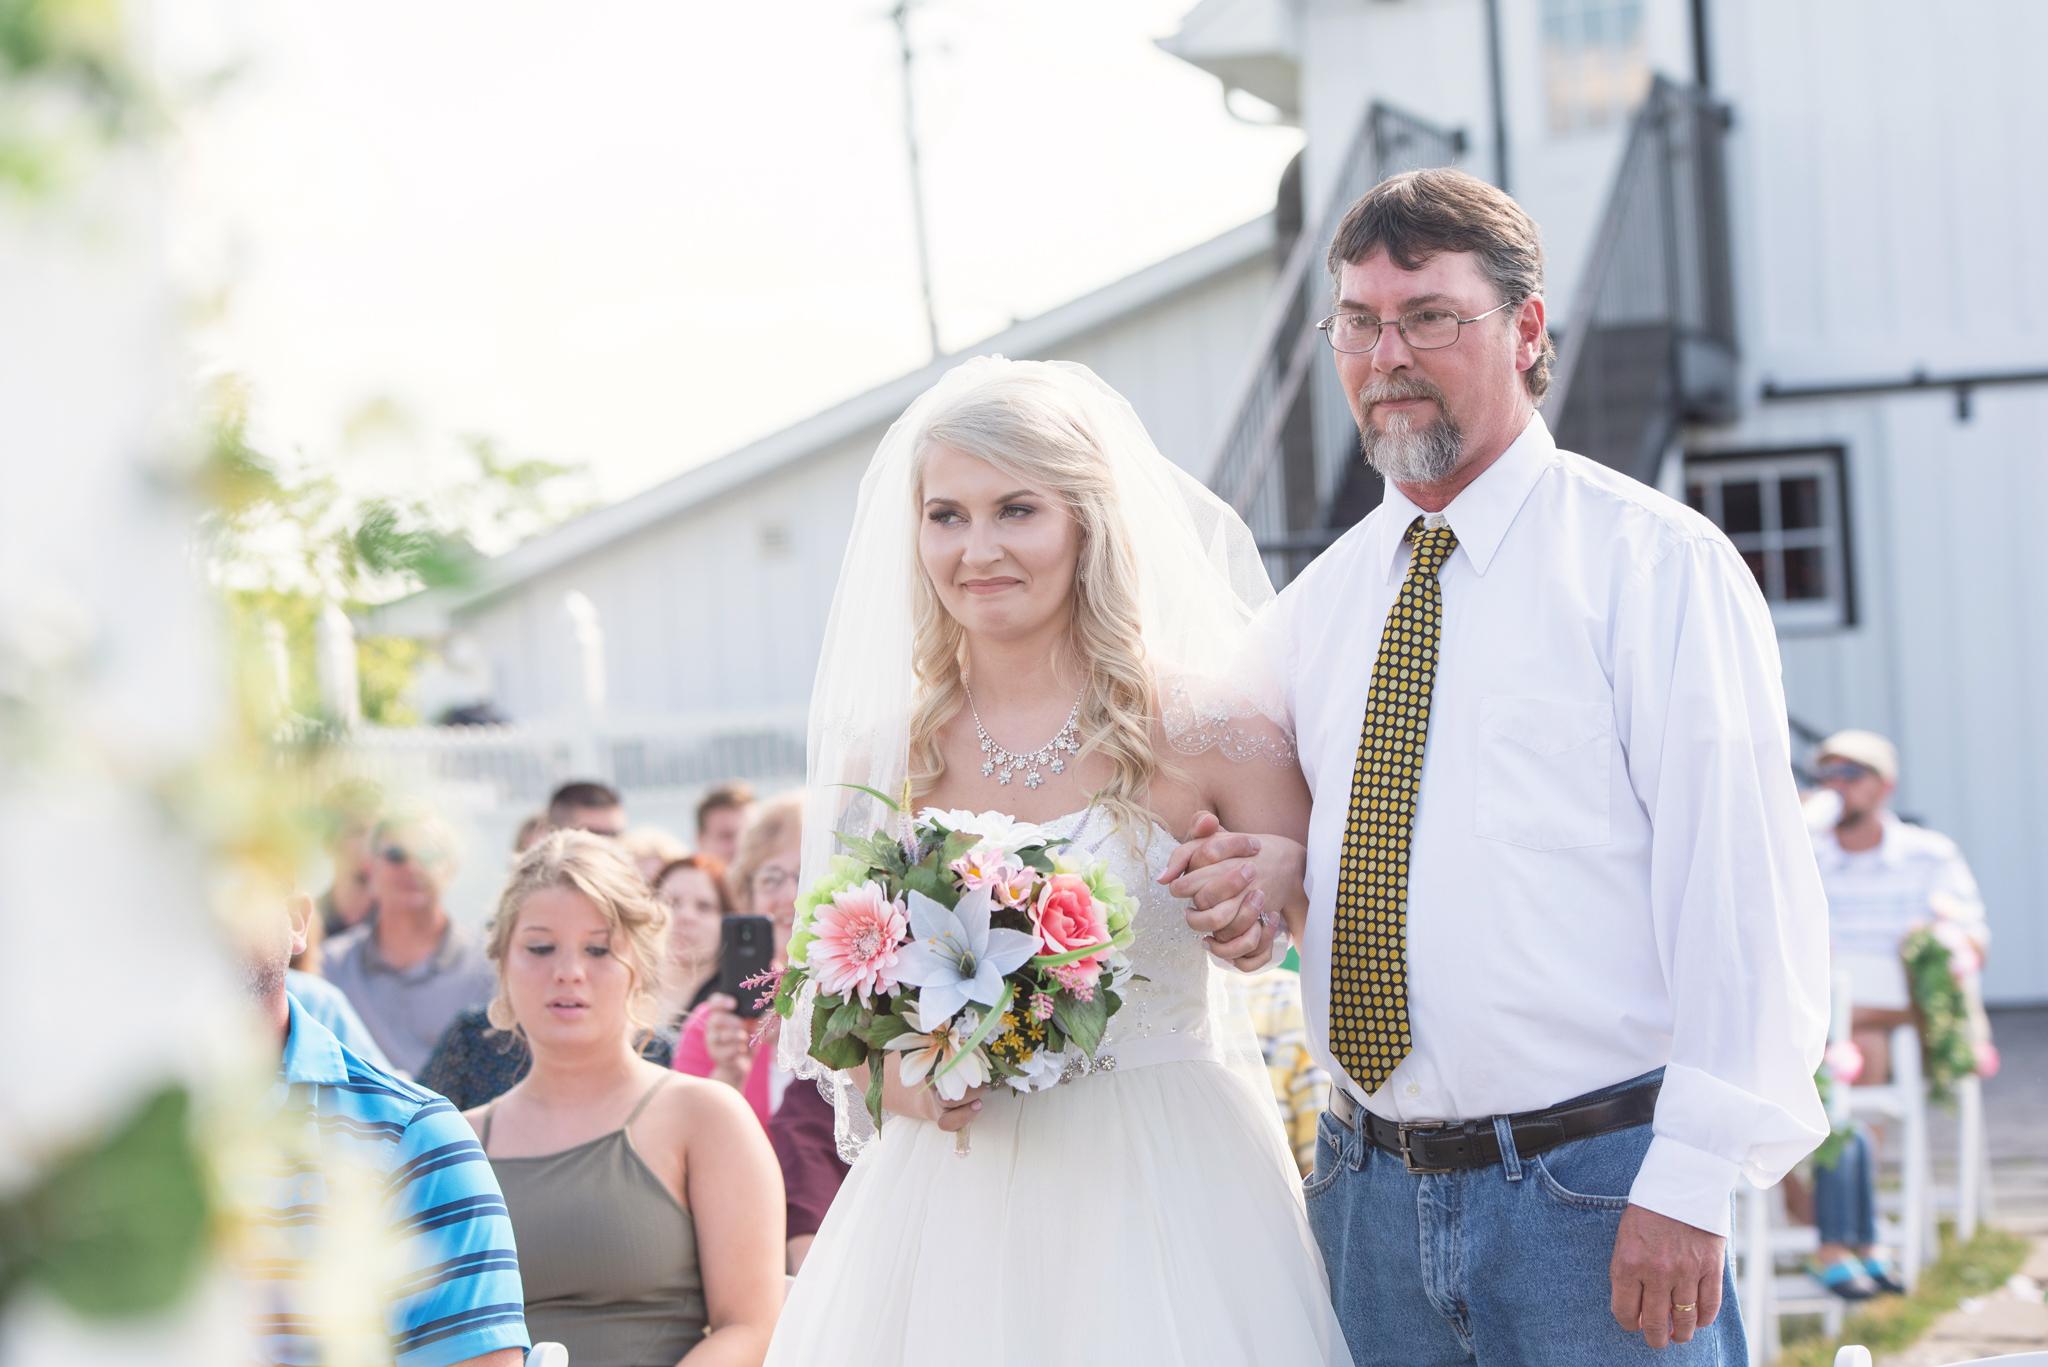 Bride, KY bride, barn wedding, KY wedding, outdoor wedding, Dry Ridge, Lexington, Somerset, Winchester, Mt Sterling, Ashland, West Chester